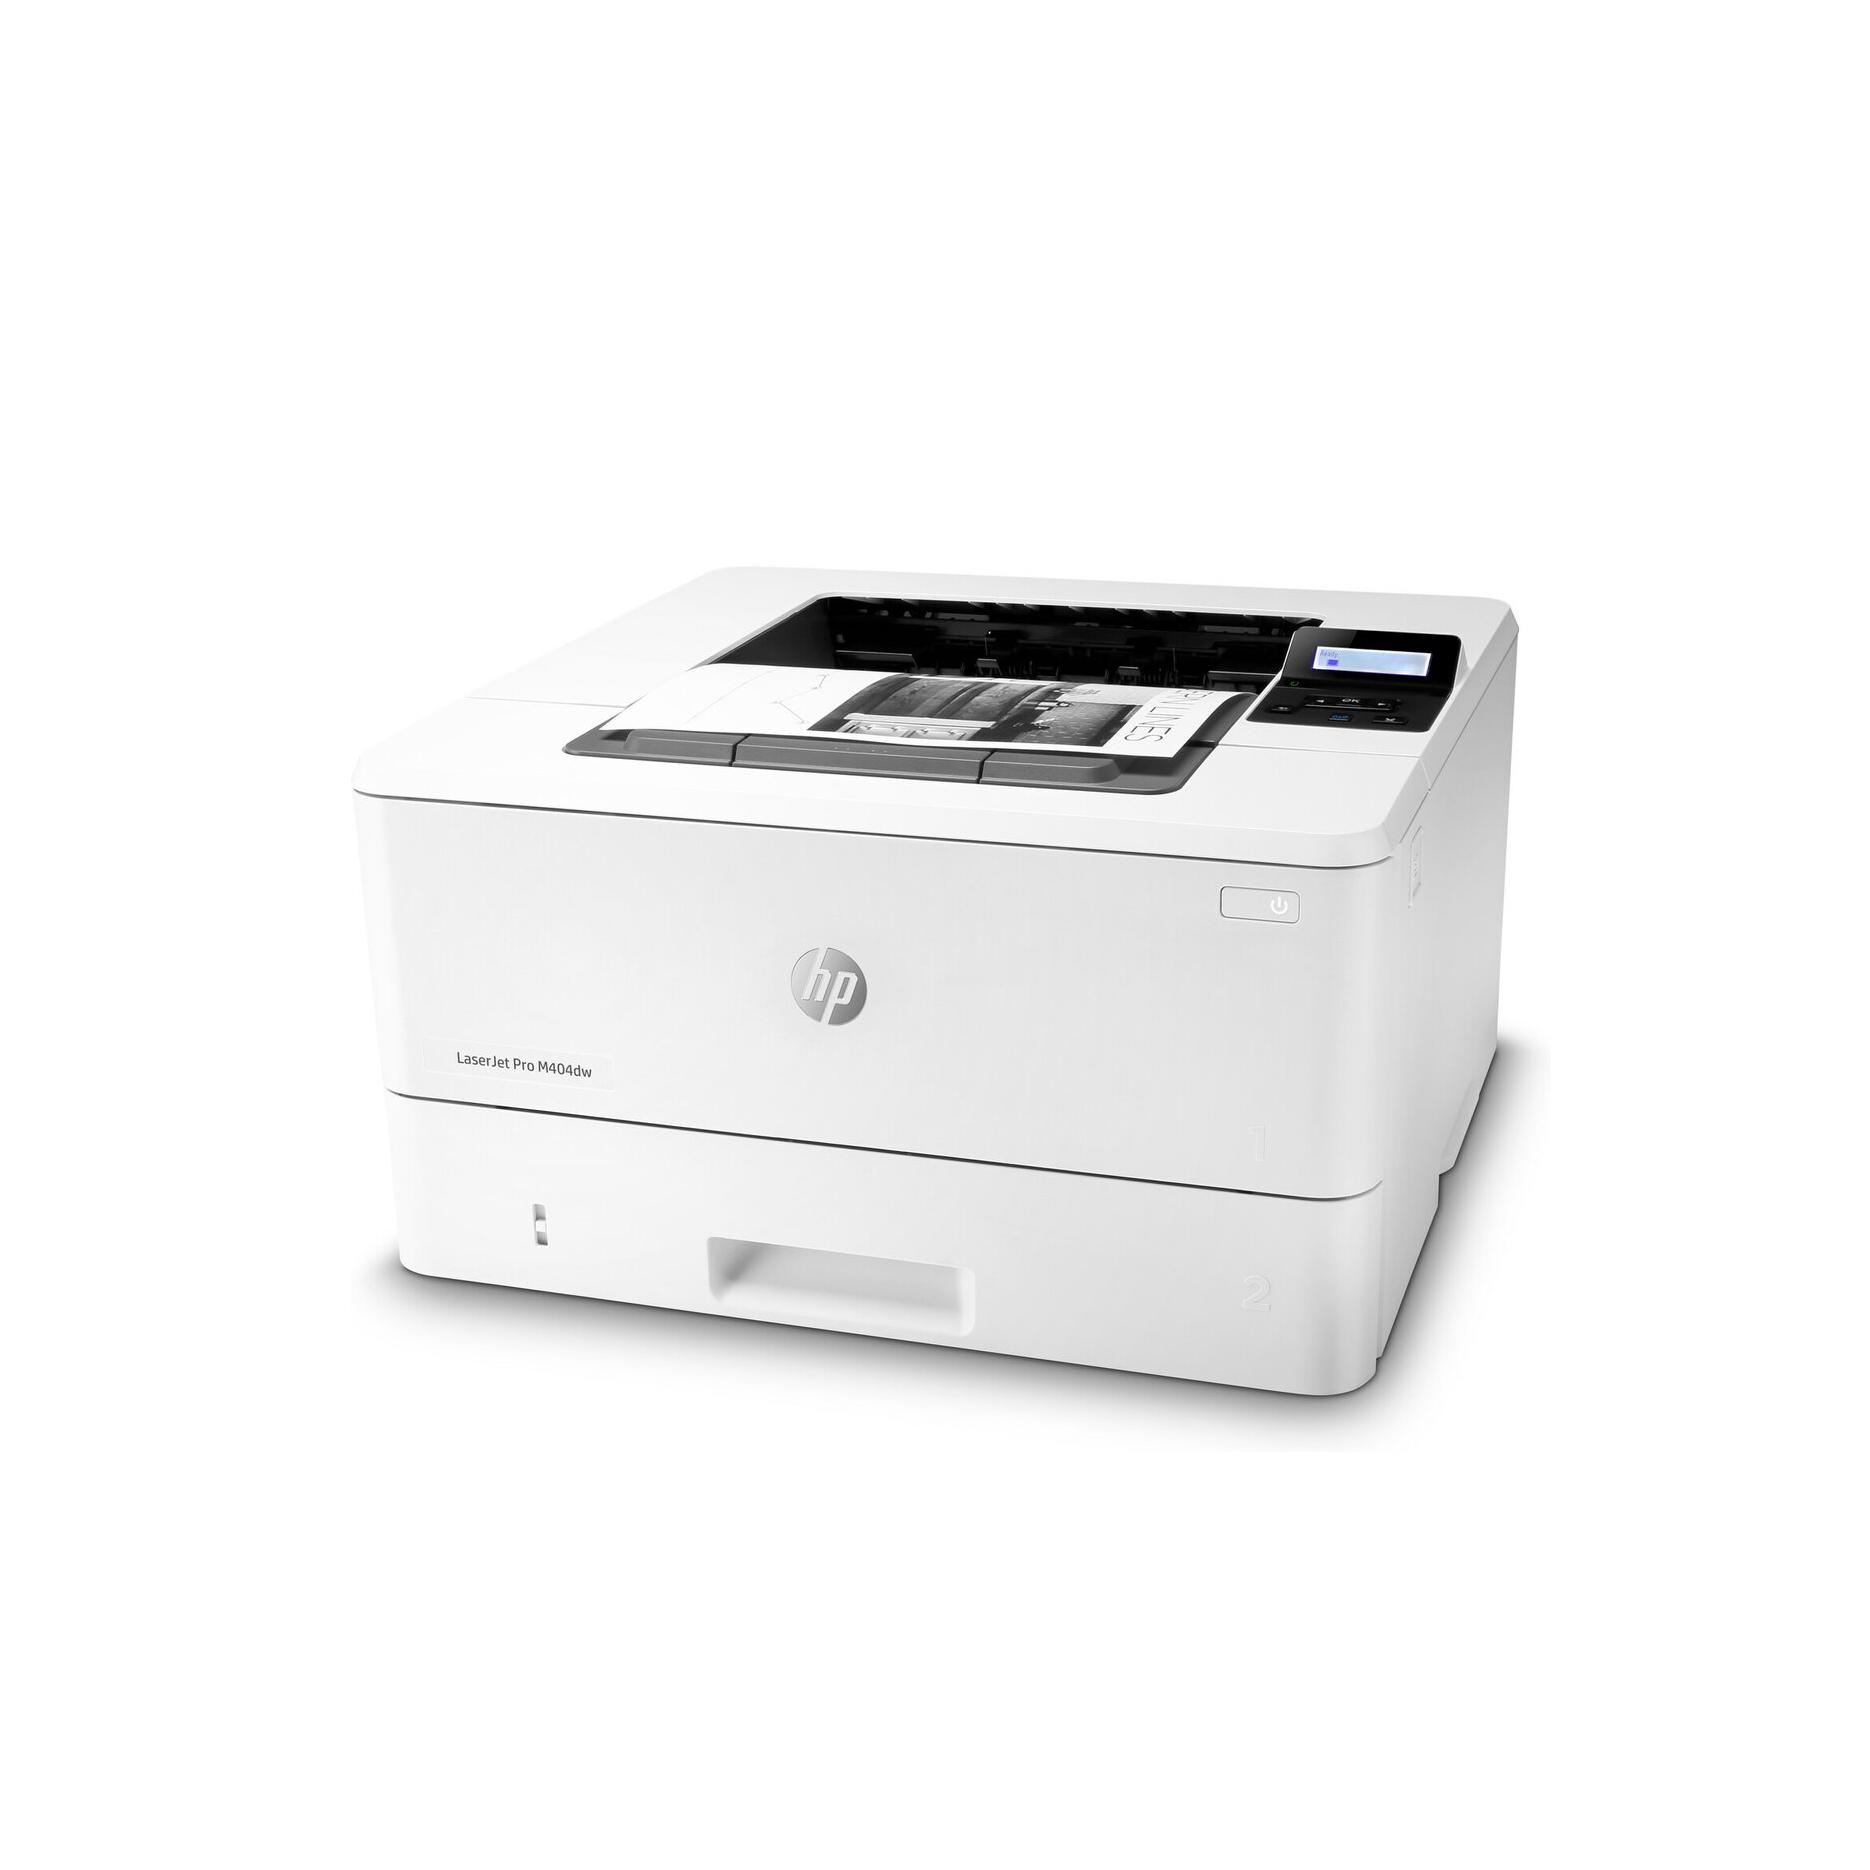 Принтер LaserJet Pro M404dn B W1A53A